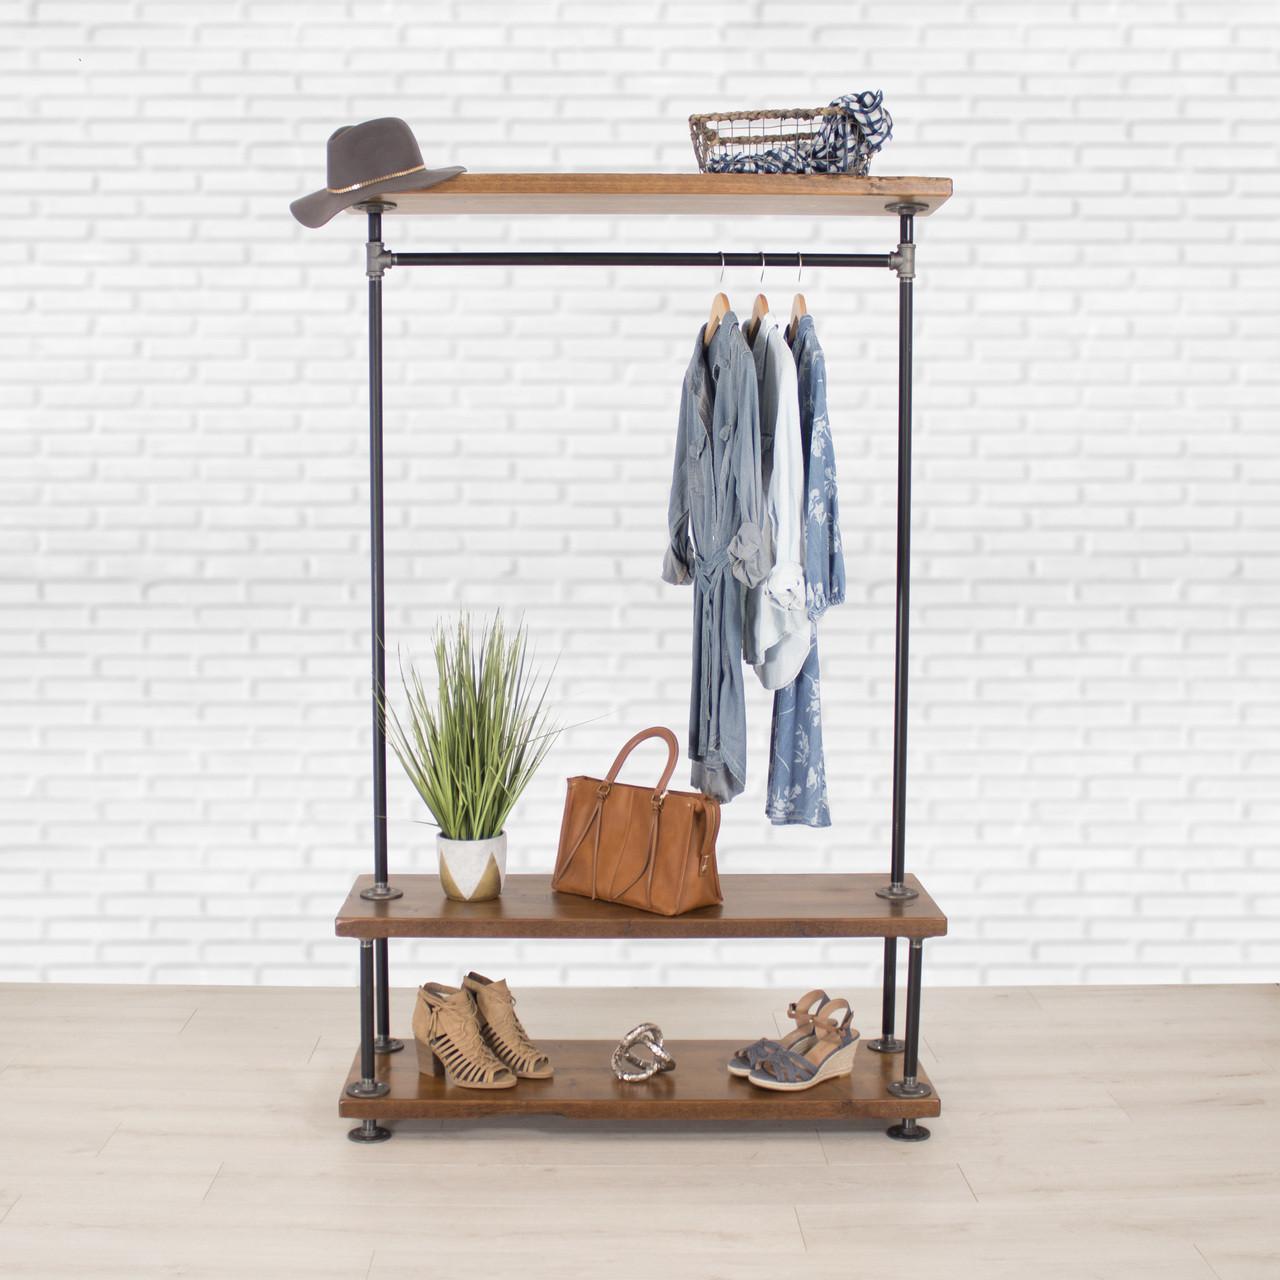 Industrial Pipe Clothing Rack With Cedar Wood Shelves Triple Shelf